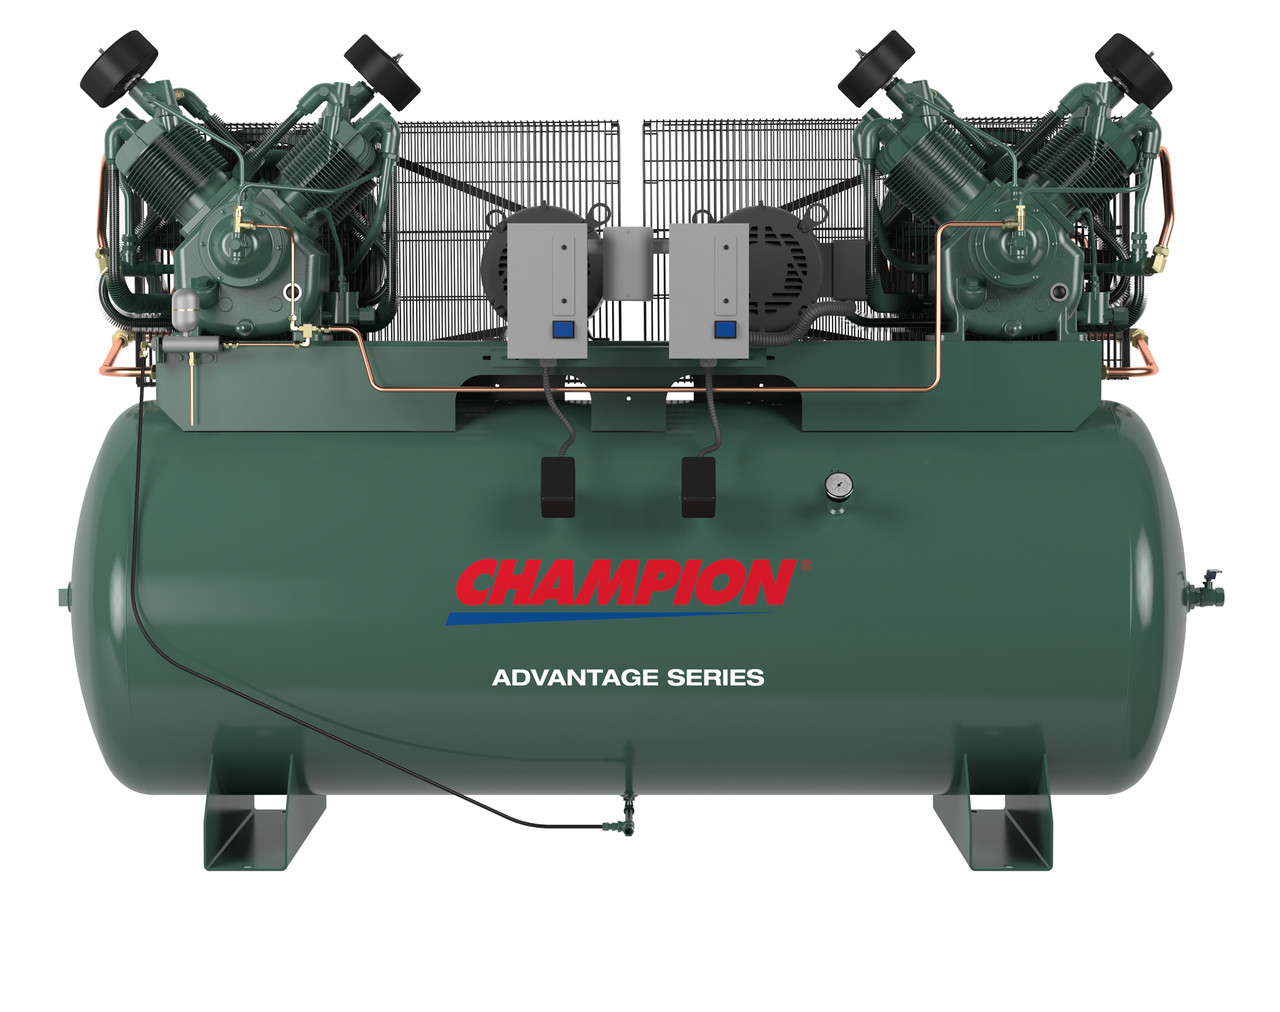 Champion HR10D-25 Advantage Series Air Compressor